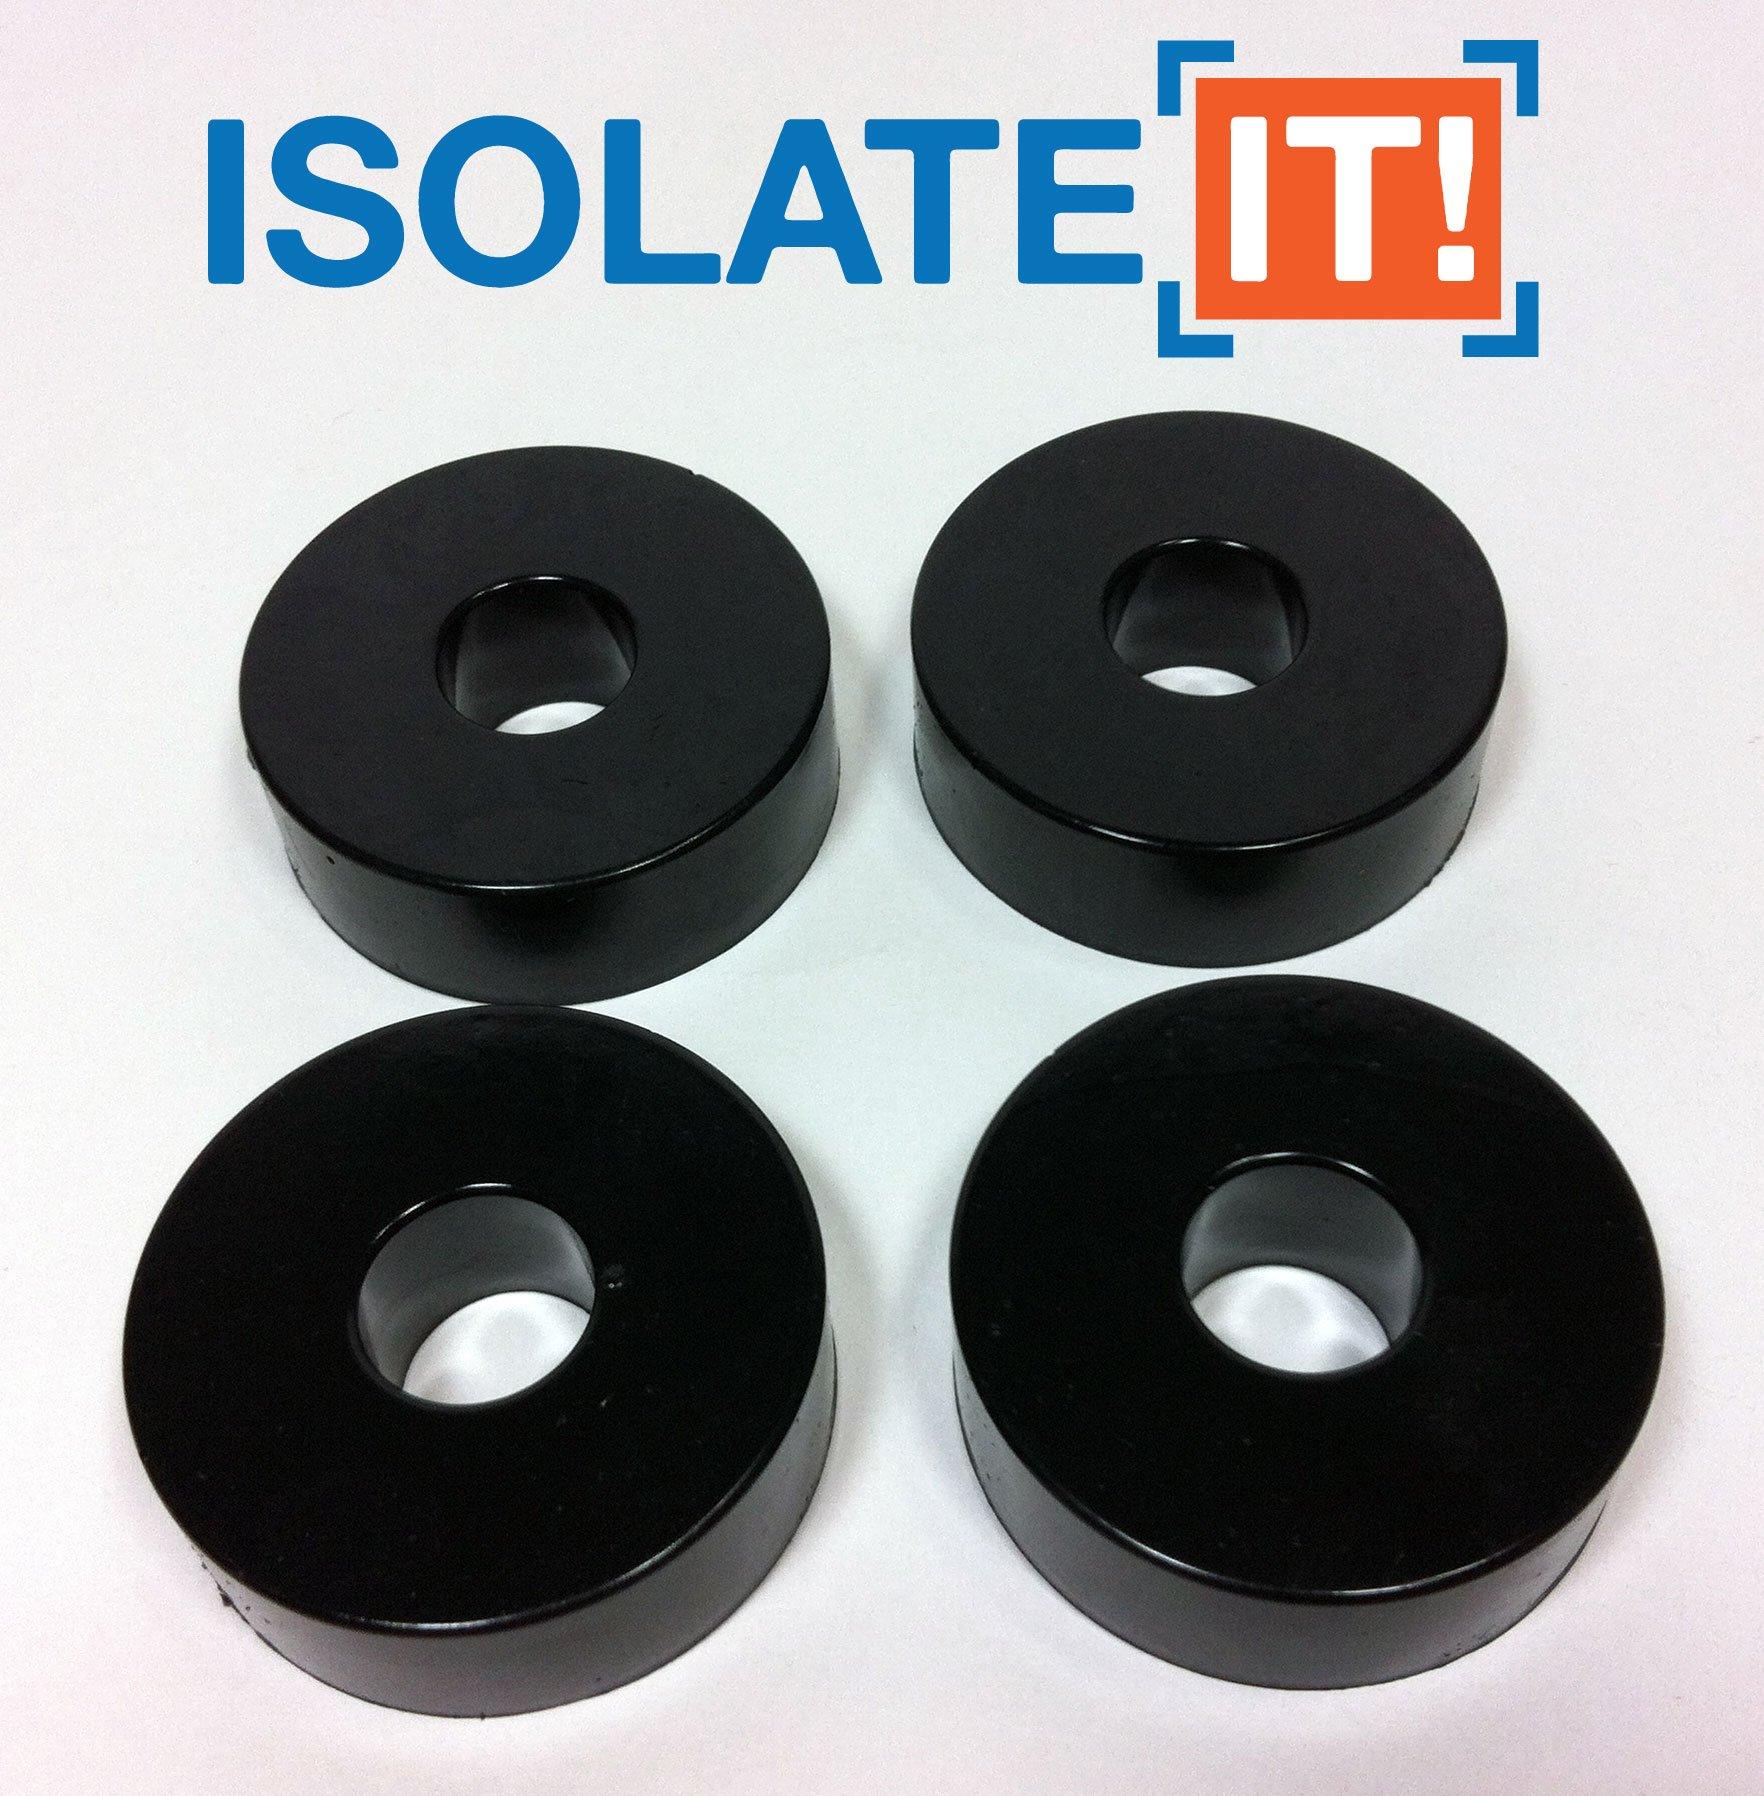 Isolate It: Sorbothane Vibration Isolation Washer 50 Duro (0.5'' ID - 1.5'' OD - 0.5'' Thick) - 4 Pack